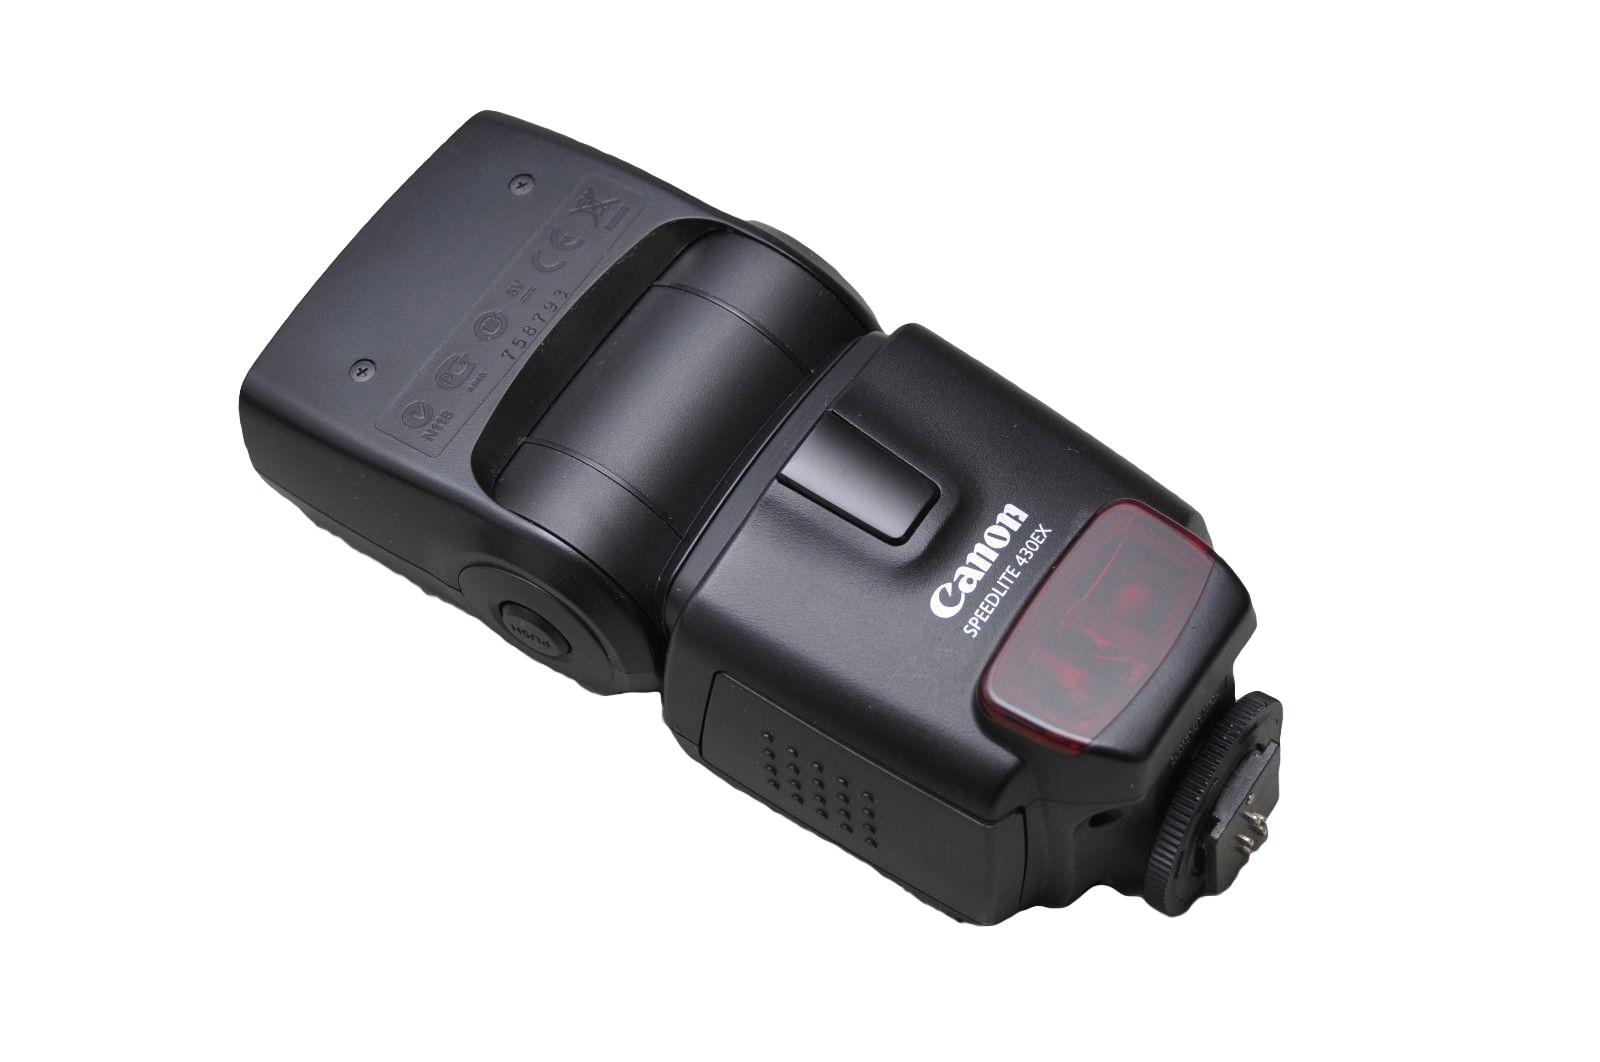 On-camera Canon 430EX 2 Speedlite TTL flash